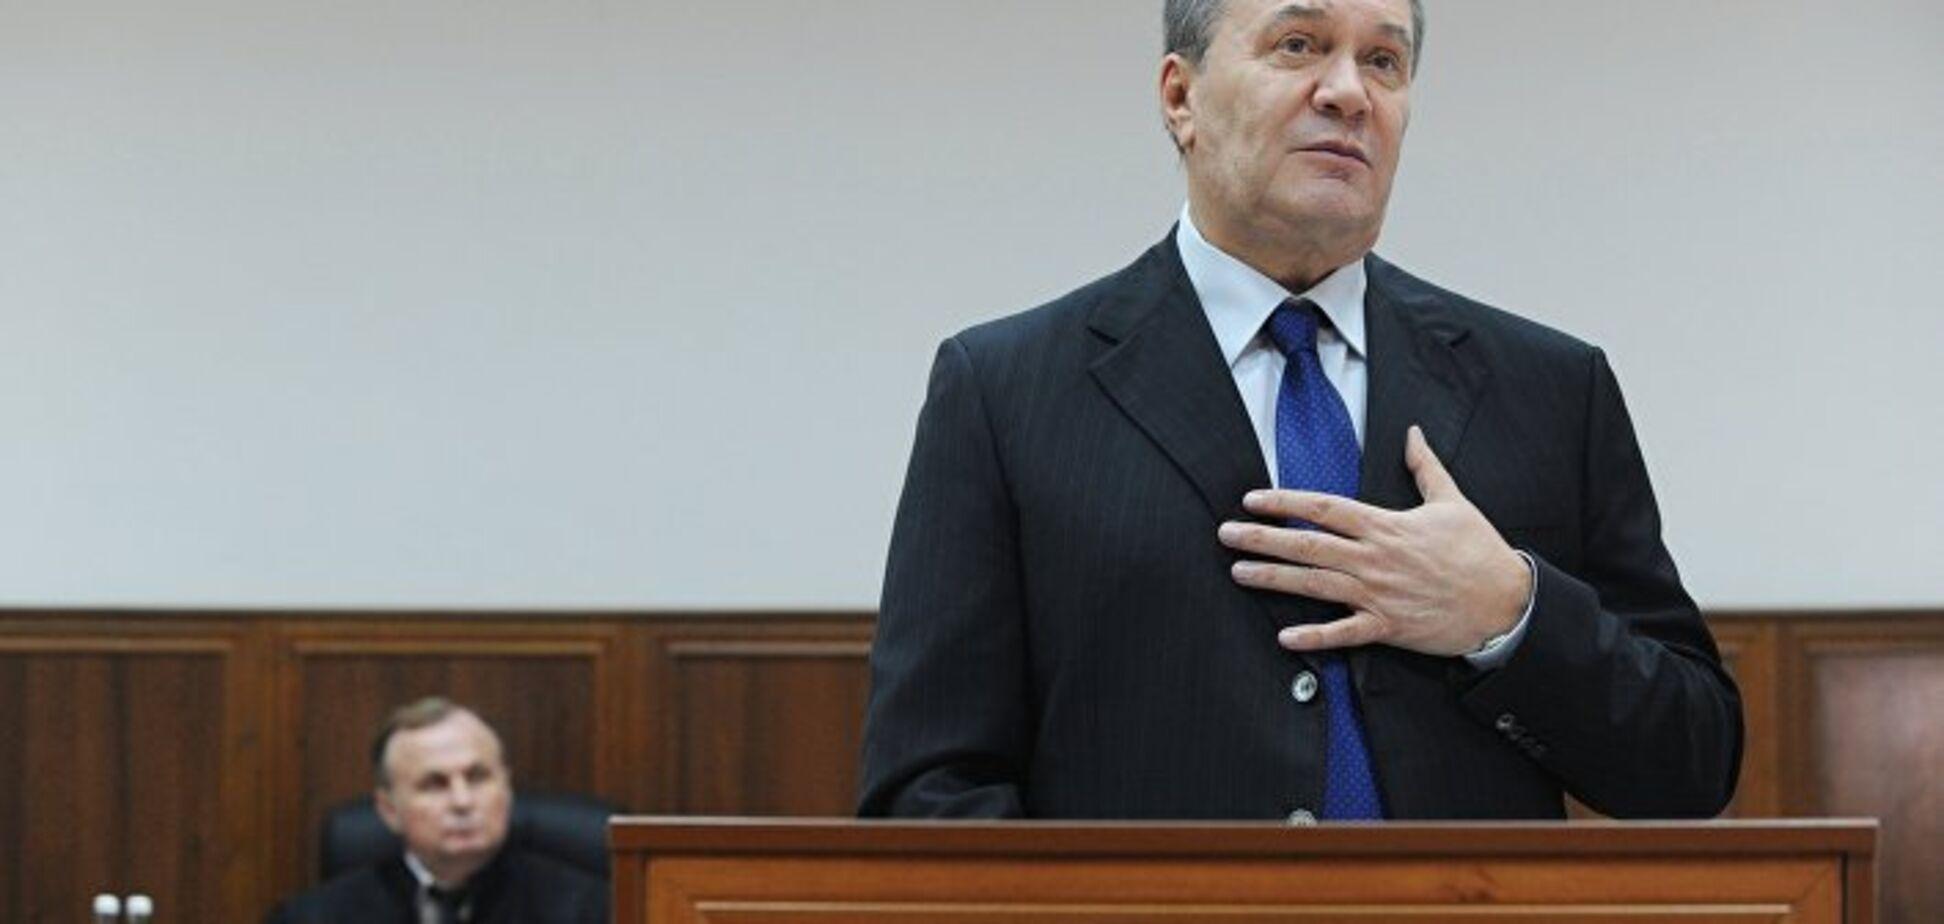 У Януковича выдвинули требование по суду над ним